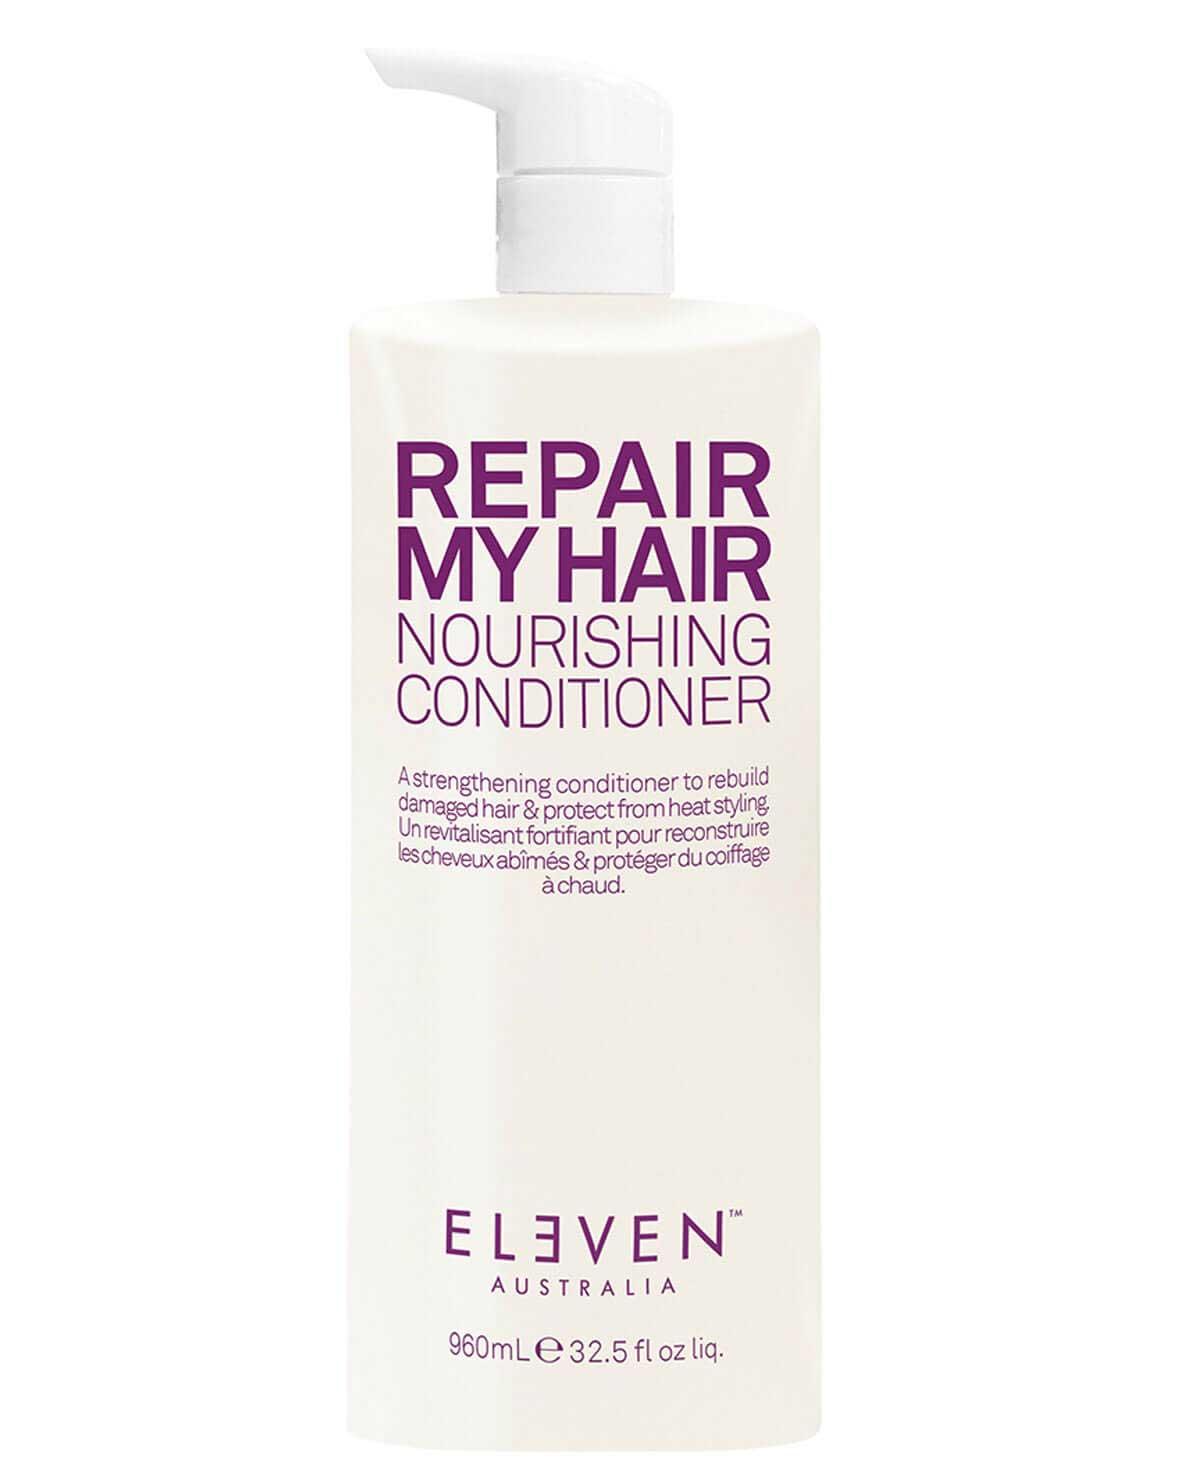 Eleven Repair My Hair Conditioner 960ml